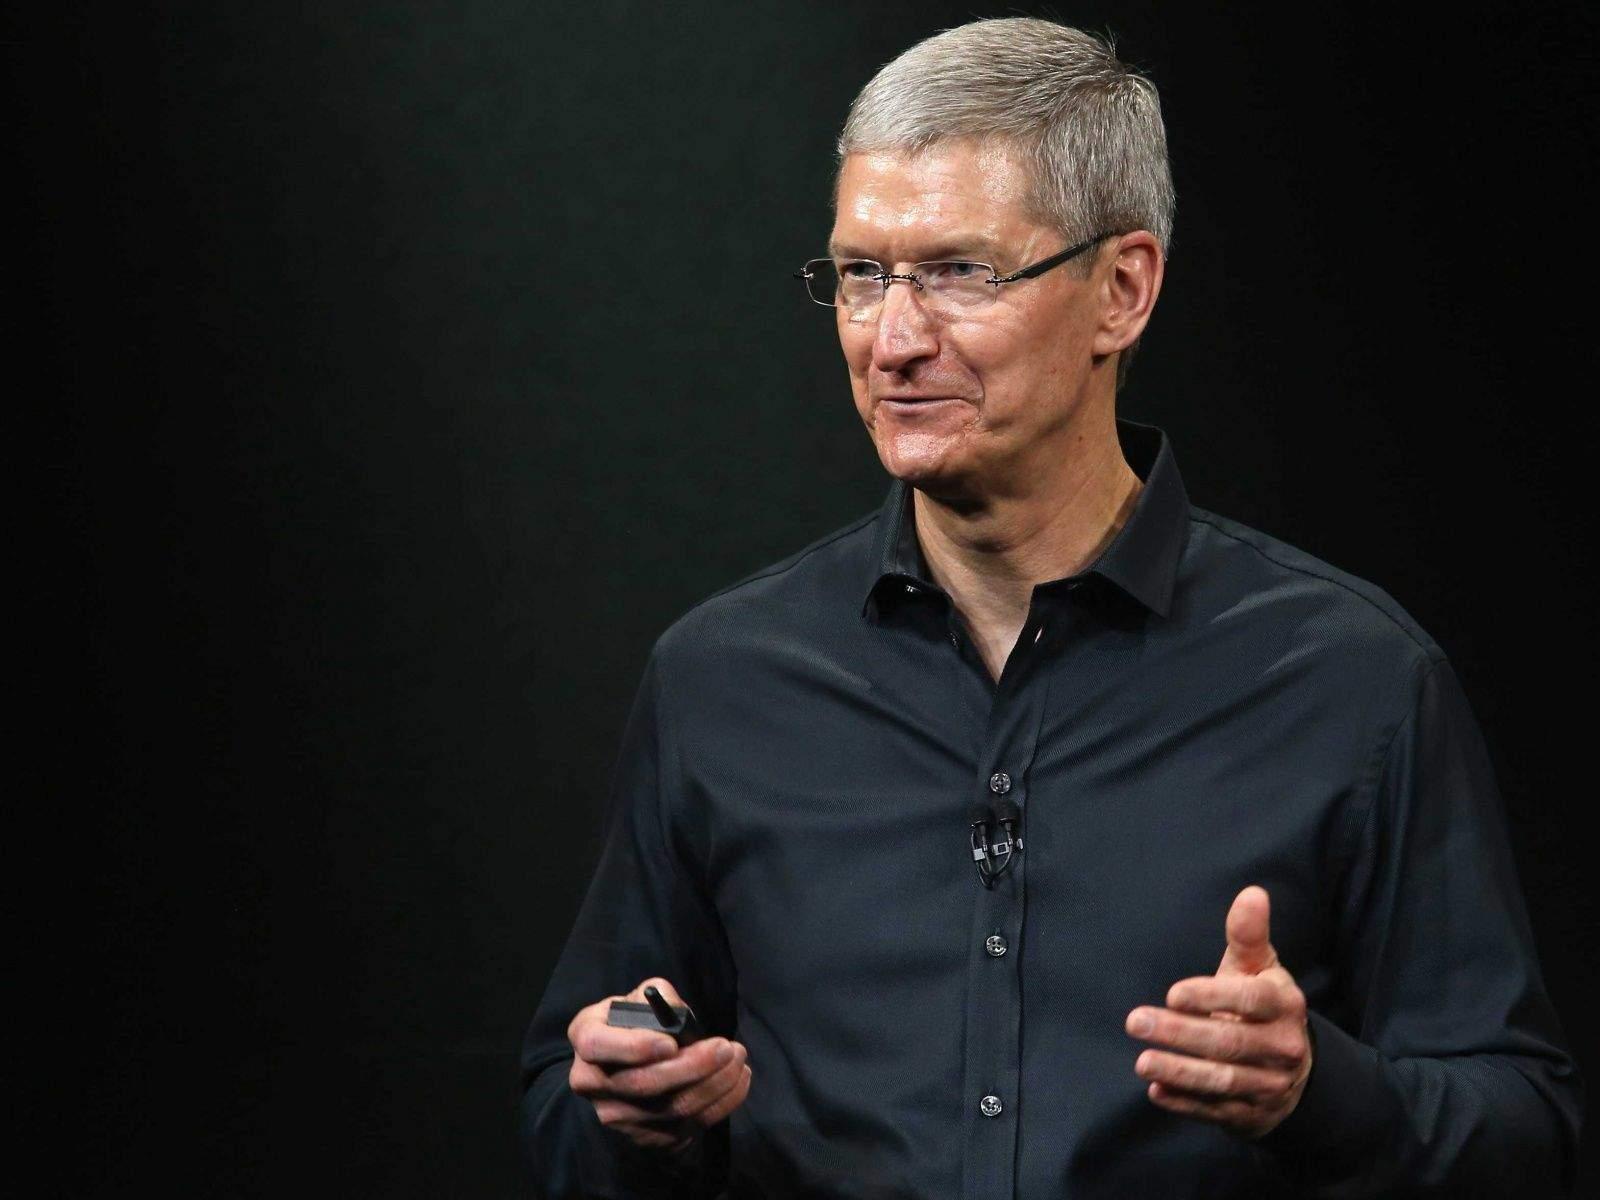 Tim Cook. Photo: Apple